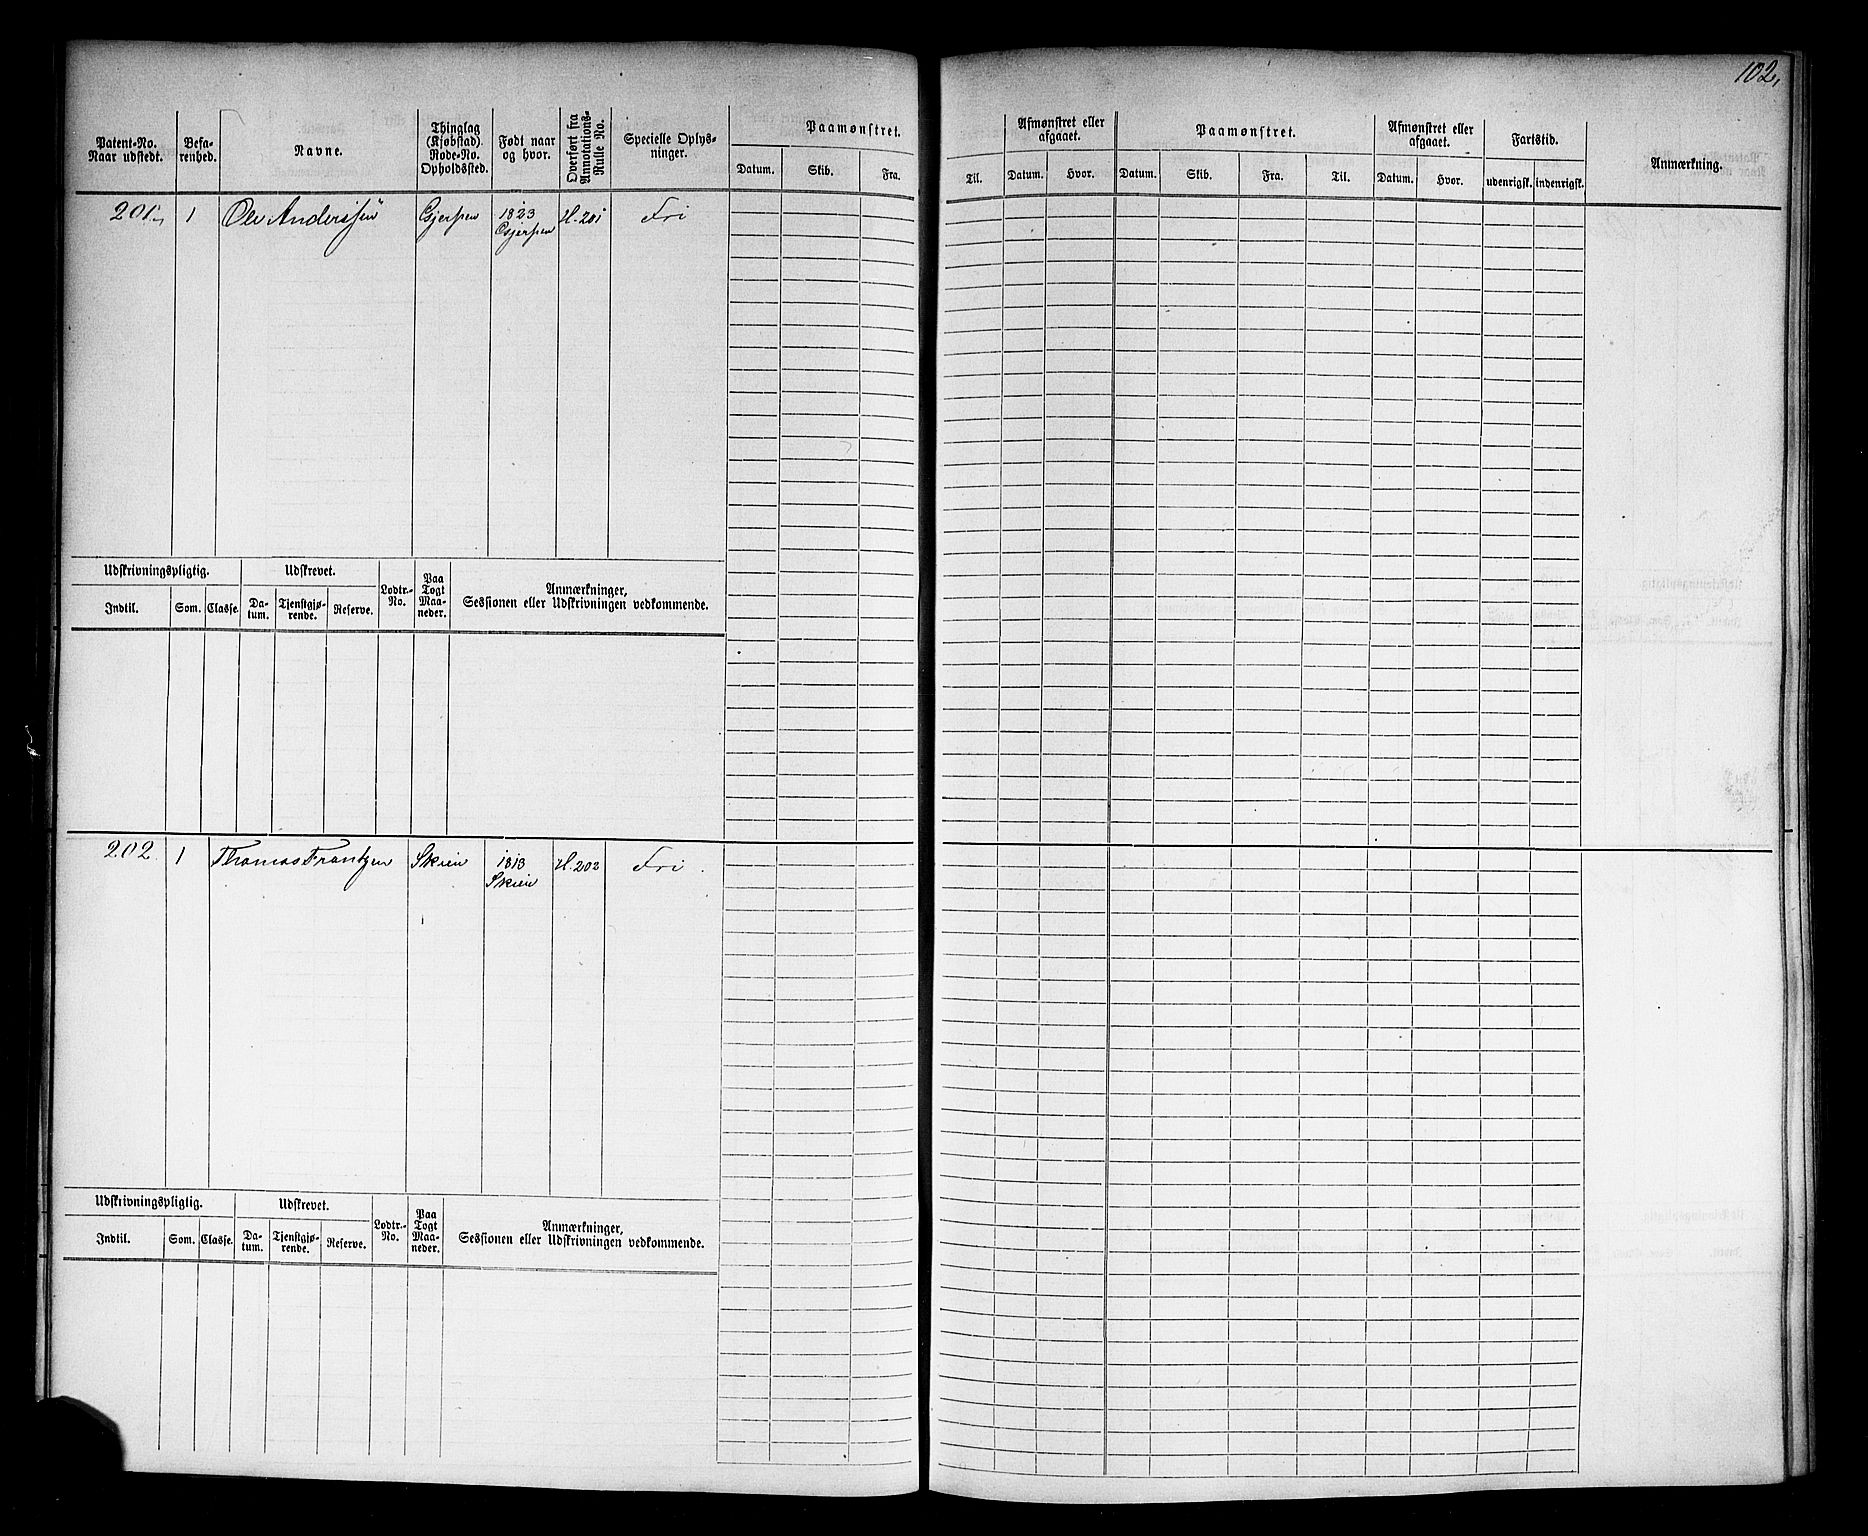 SAKO, Skien innrulleringskontor, F/Fb/L0003: Hovedrulle, 1868-1871, s. 103